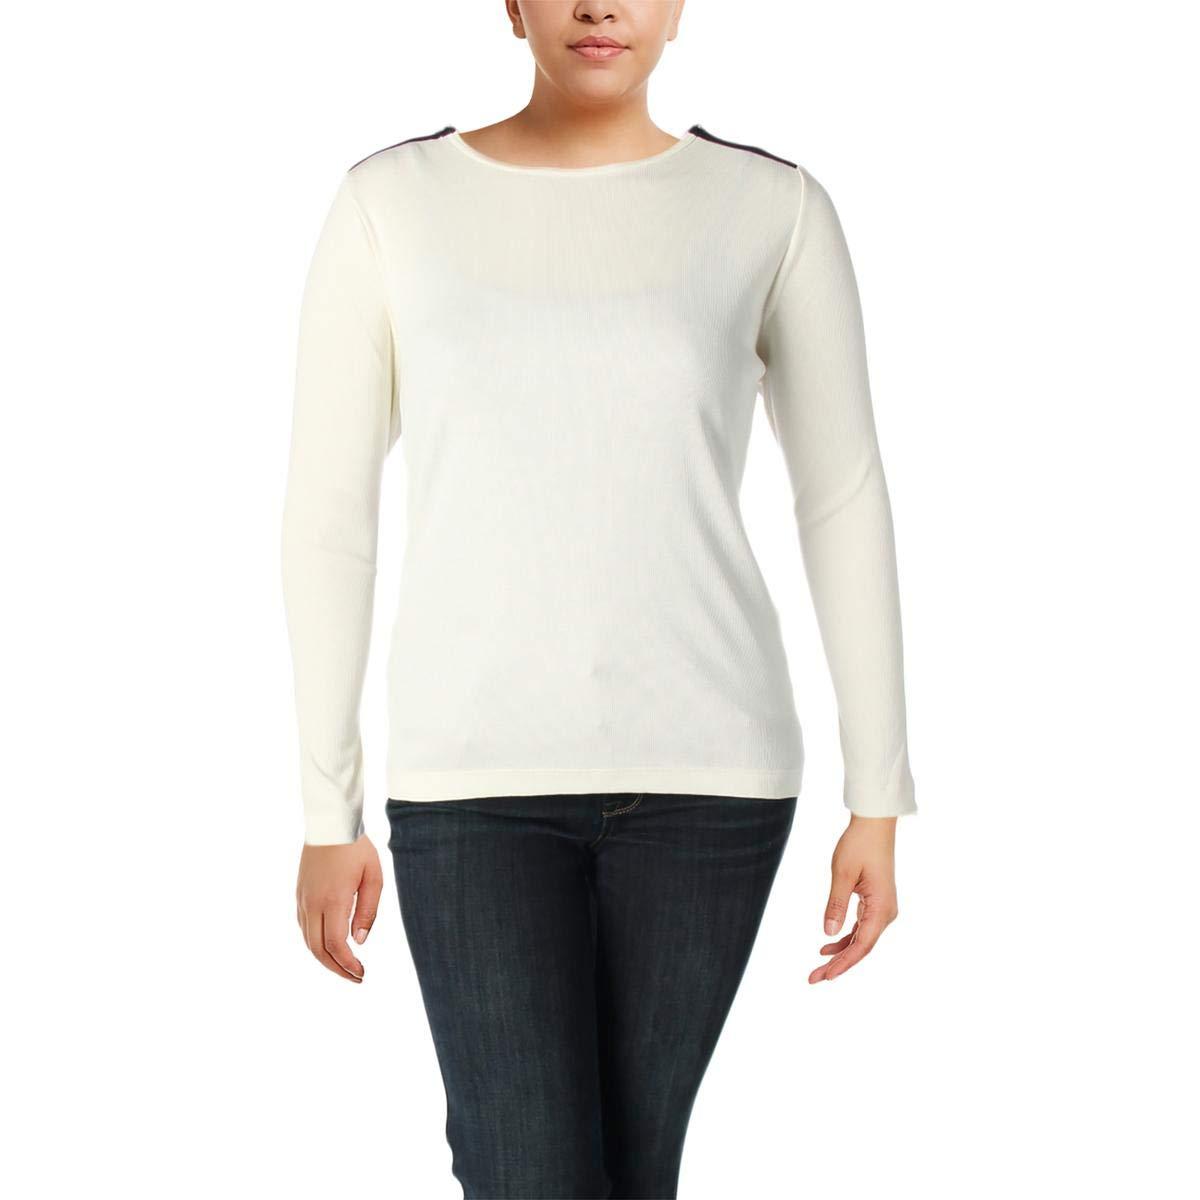 Lauren Ralph Lauren Womens Plus Casual Rib Knit Knit Top Ivory 2X